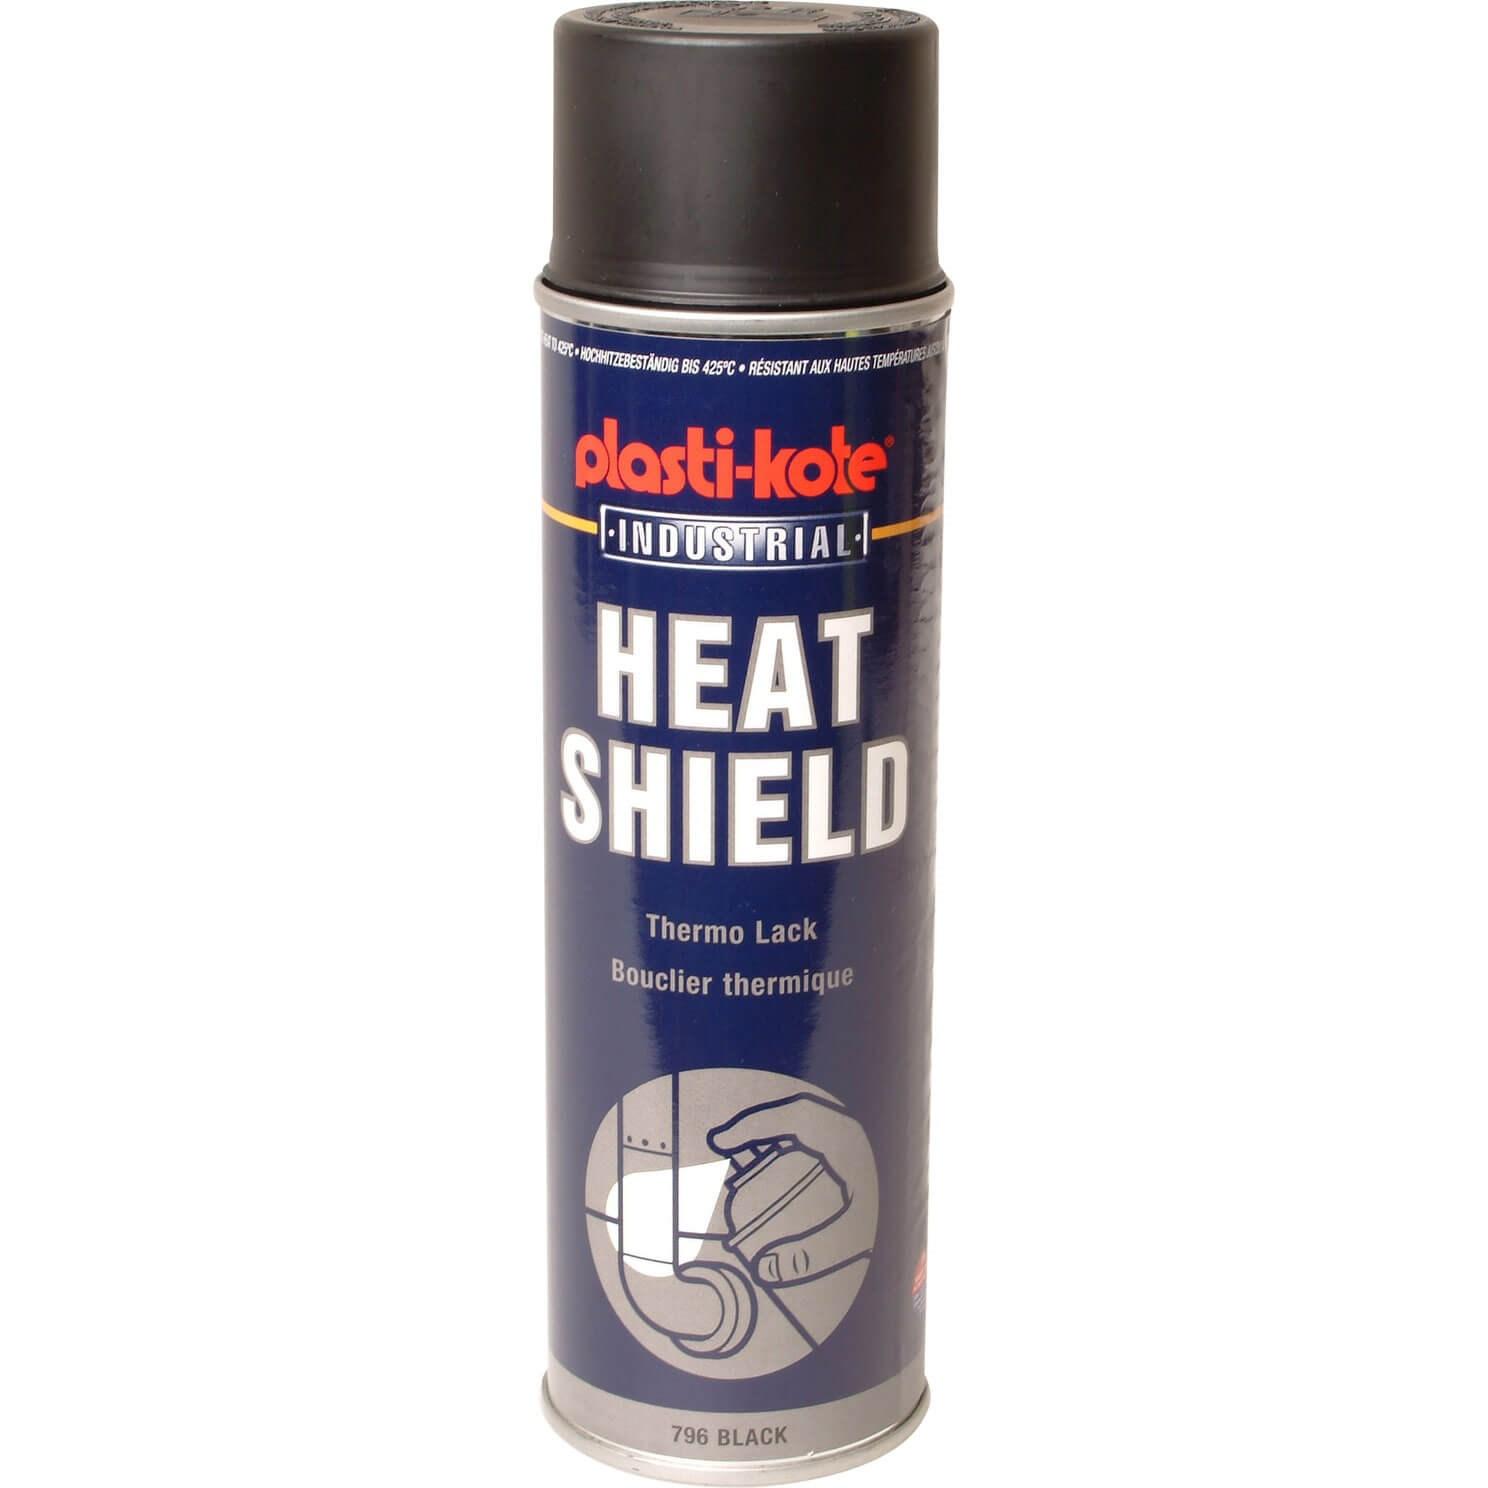 Plastikote Industrial Heat Shield Aerosol Spray Paint